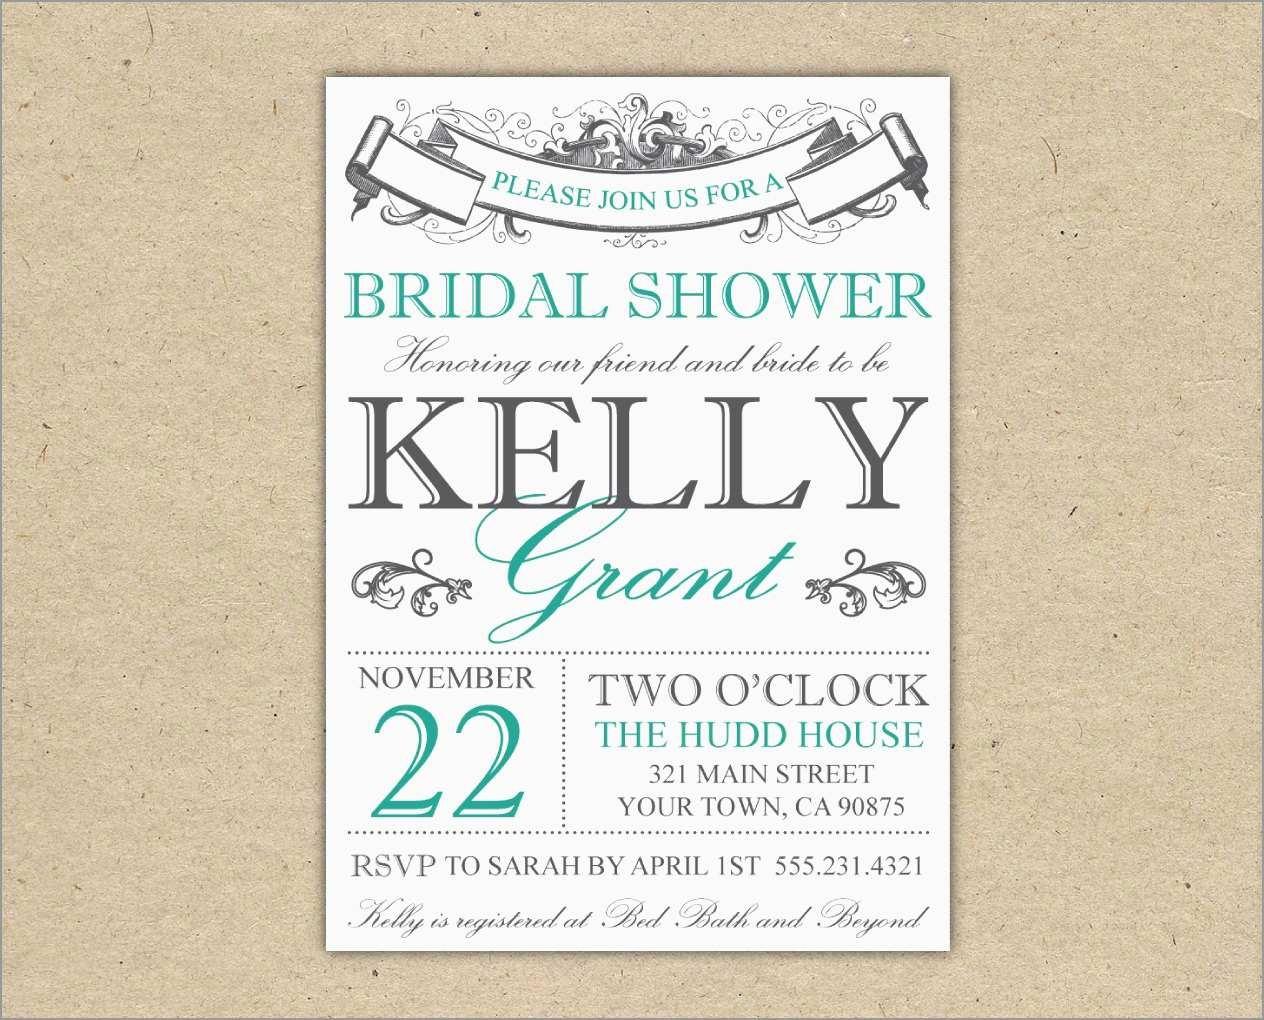 Free Printable Bridal Shower Invitations Templates Pleasant Bridal - Invitations Bridal Shower Free Printable